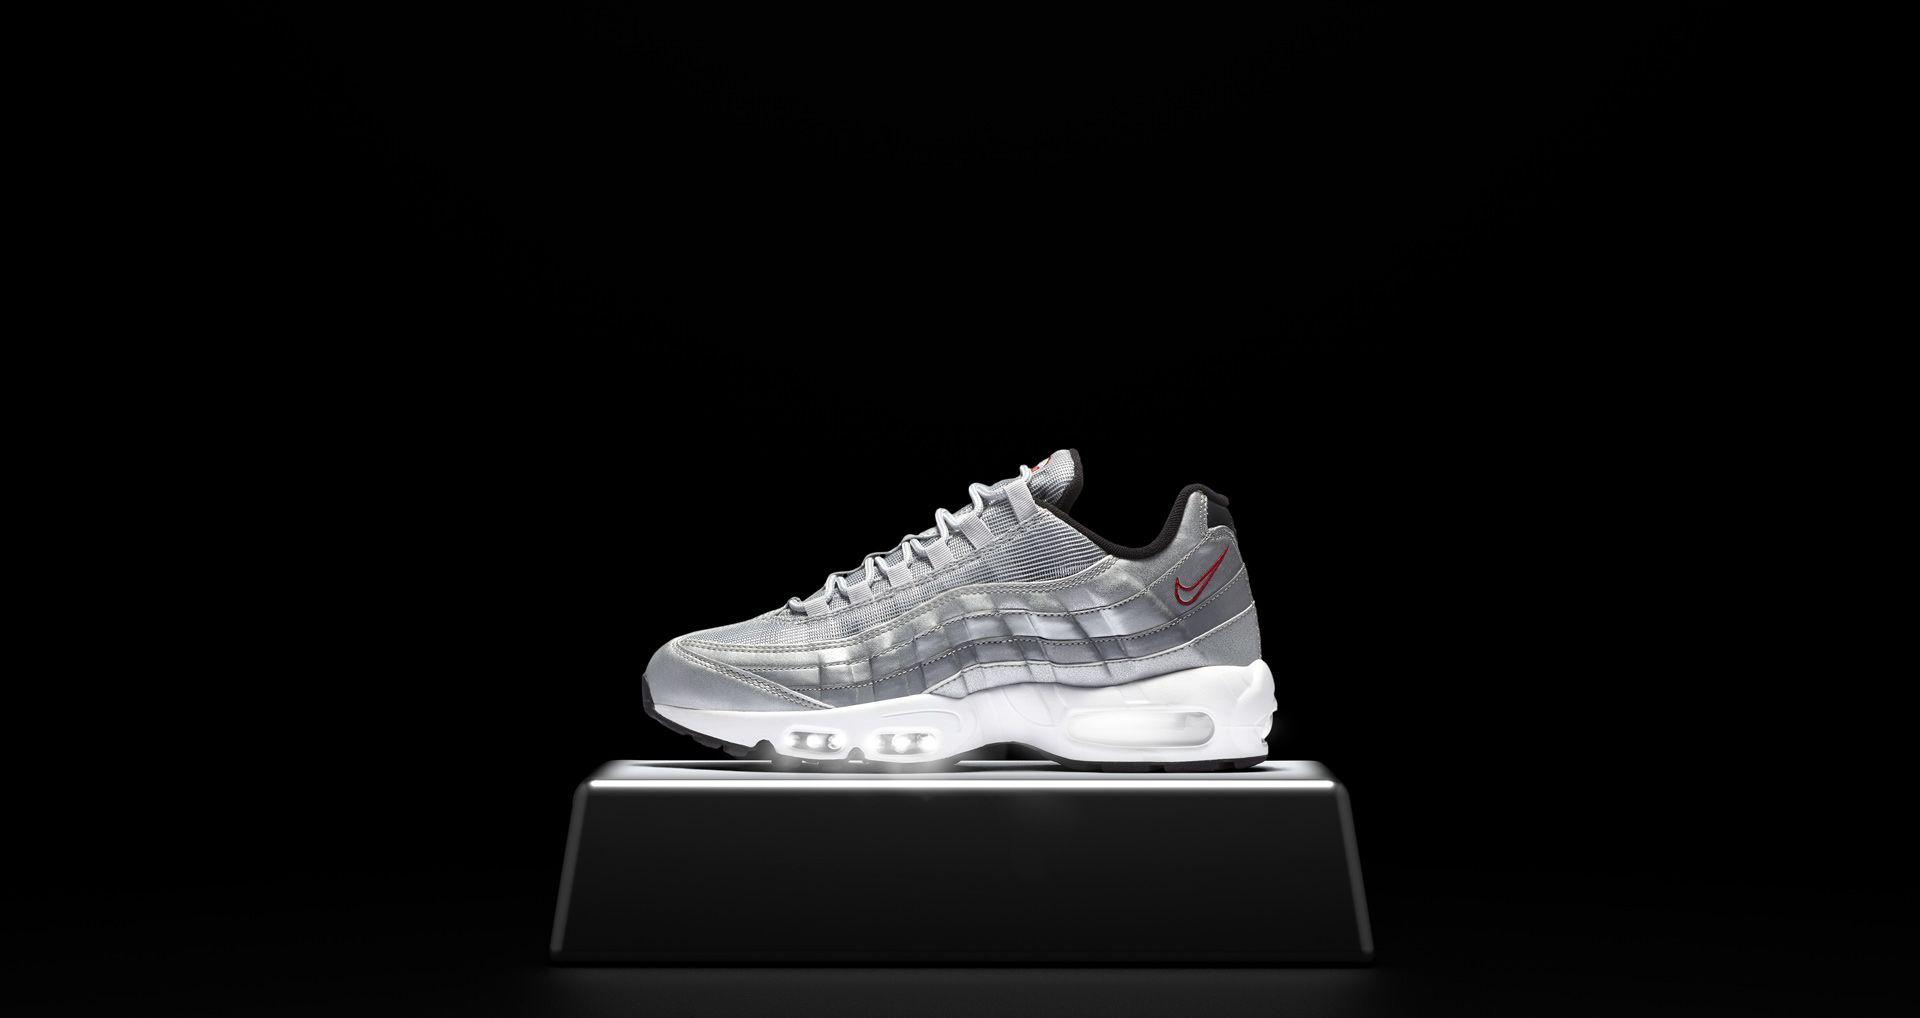 9ea396d21edc Nike Air Max 95 Premium  Metallic Silver . Nike+ SNKRS